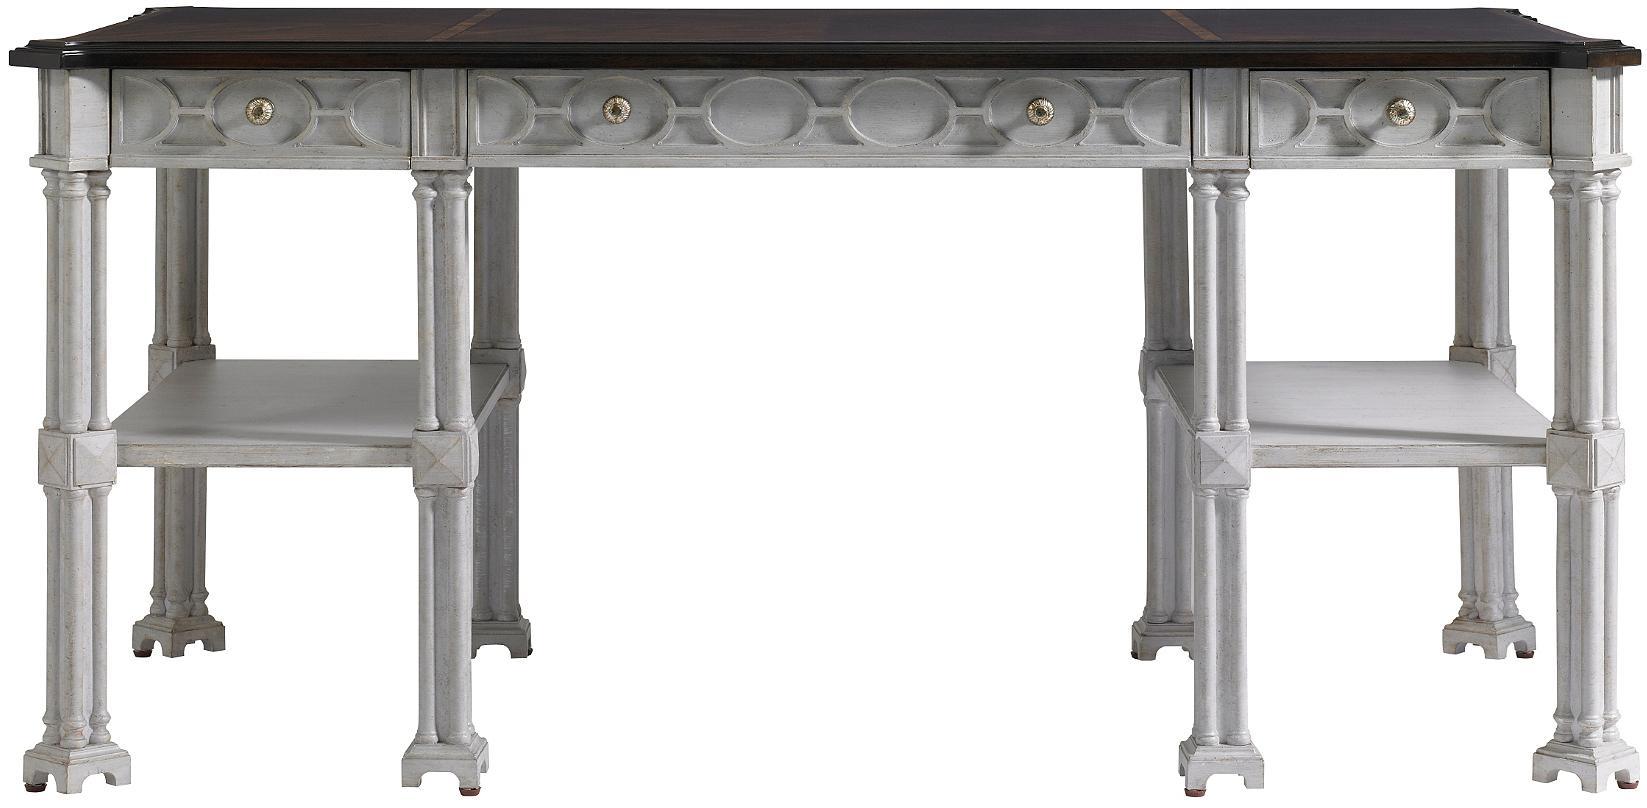 Stanley Furniture Charleston Regency Russell Writing Desk - Item Number: 302-55-03